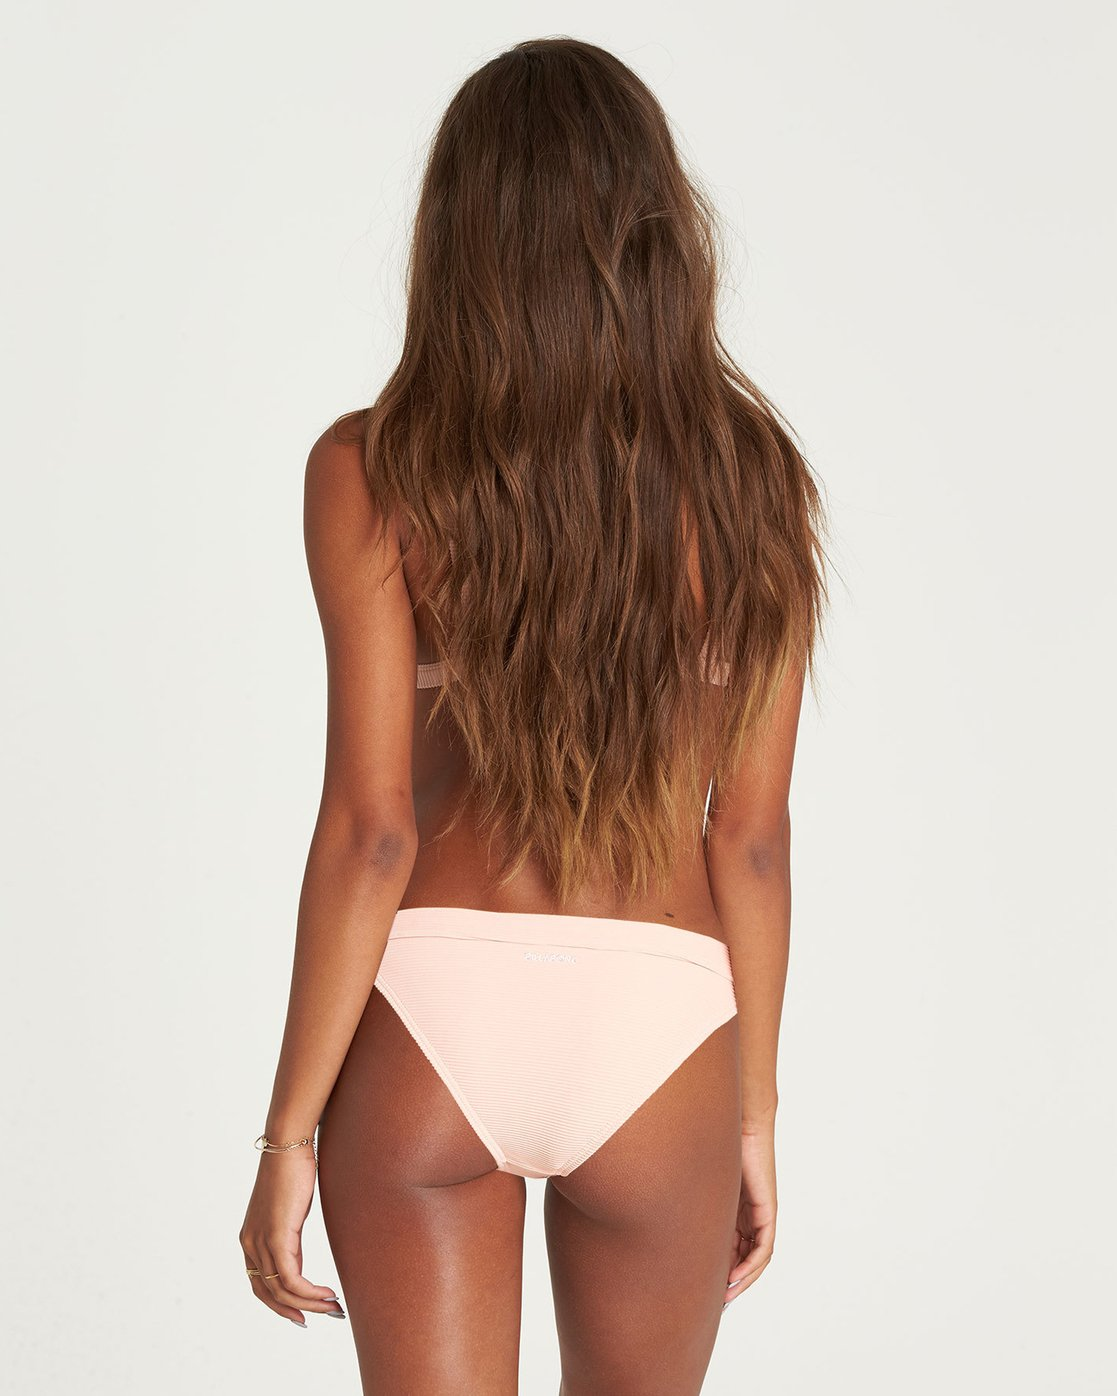 c9020eeae0 0 Tanlines Tropic Bikini Bottom Pink XB18NBTA Billabong